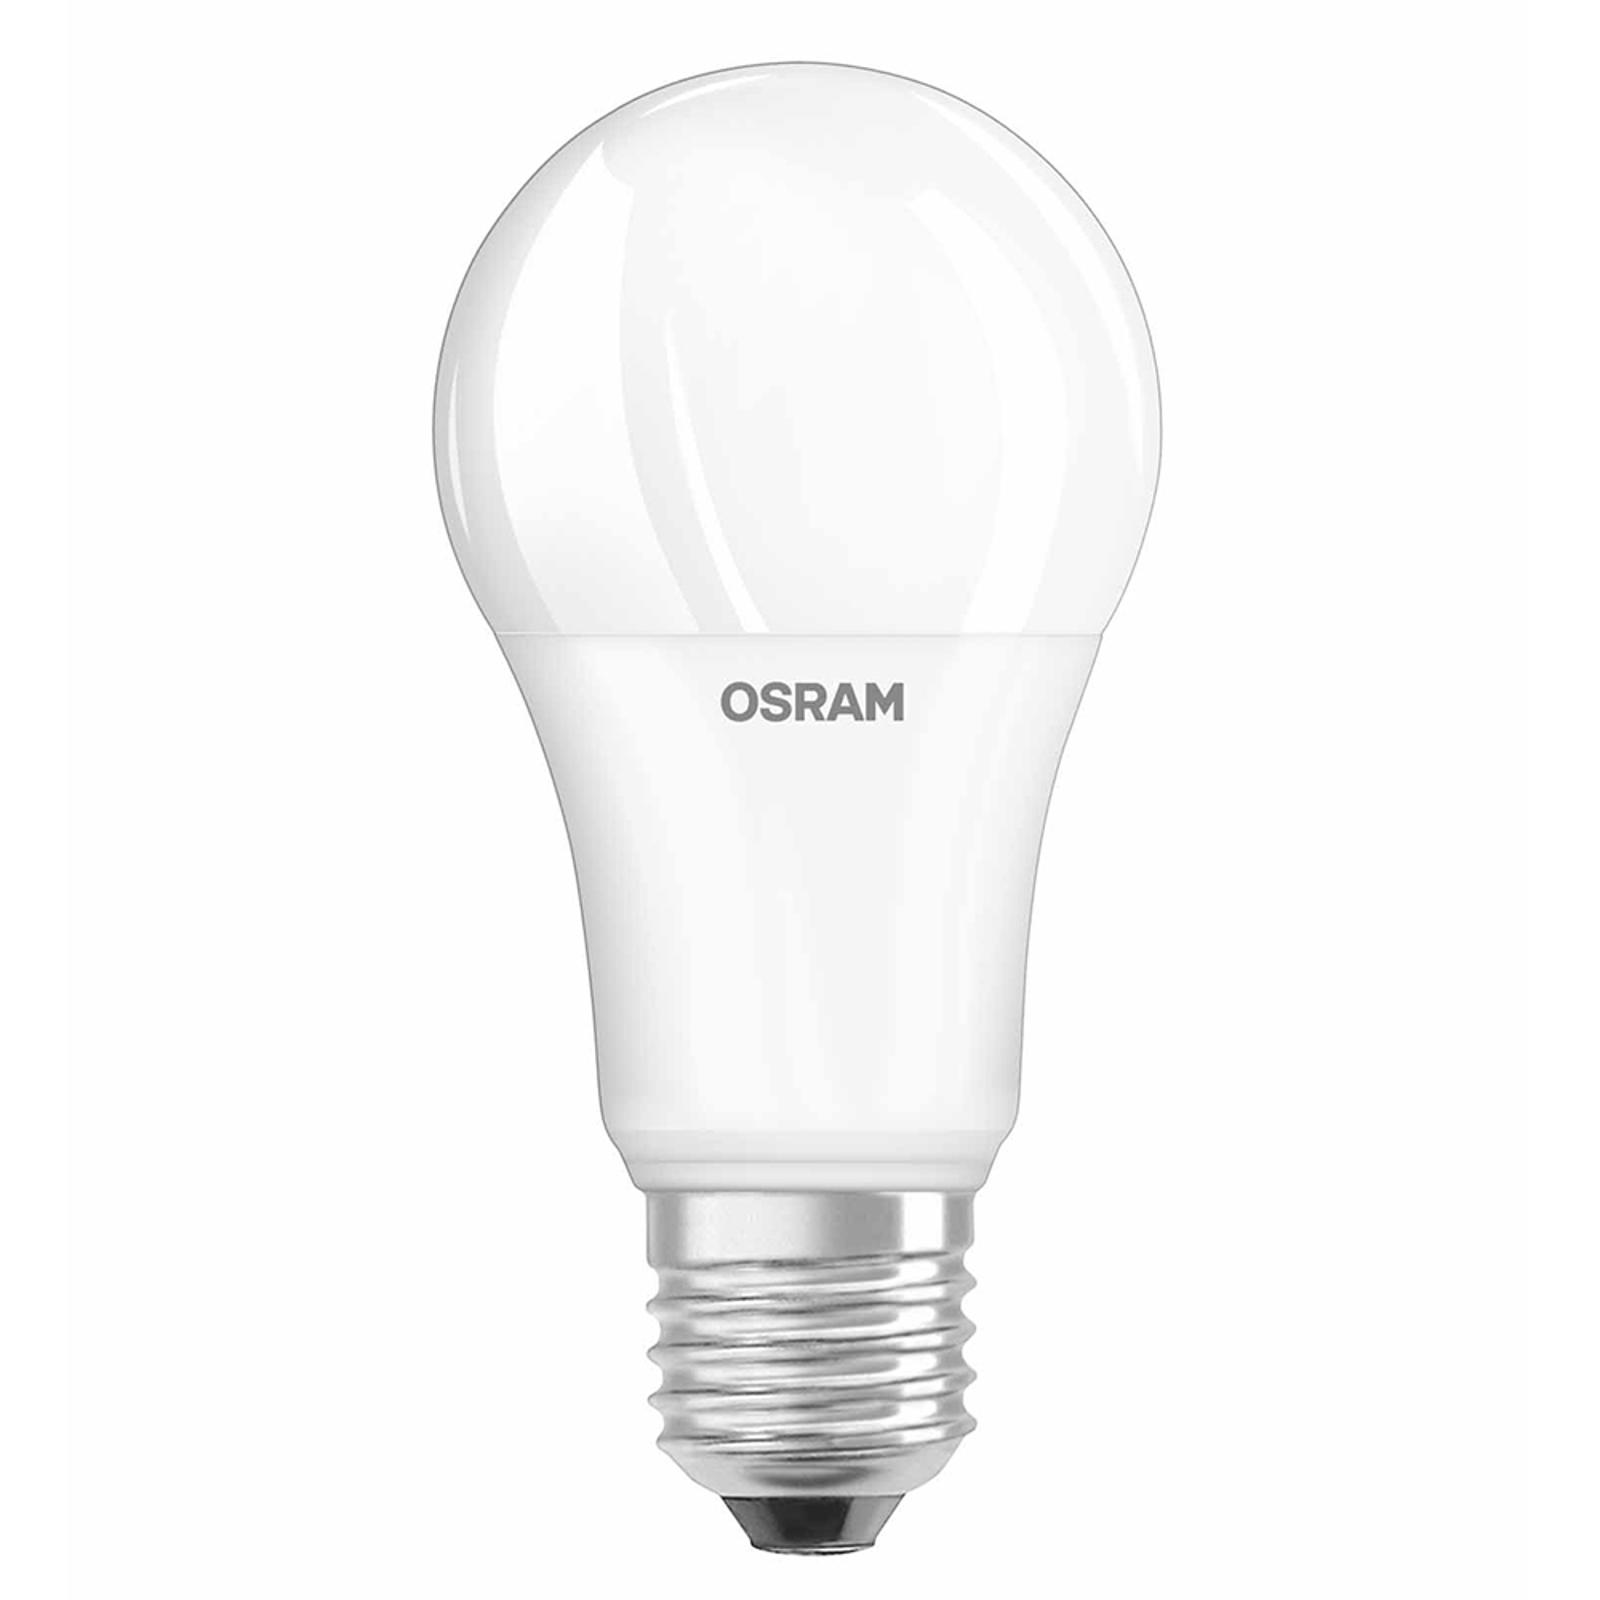 OSRAM lampadina LED E27 13W 827 Superstar, dimming